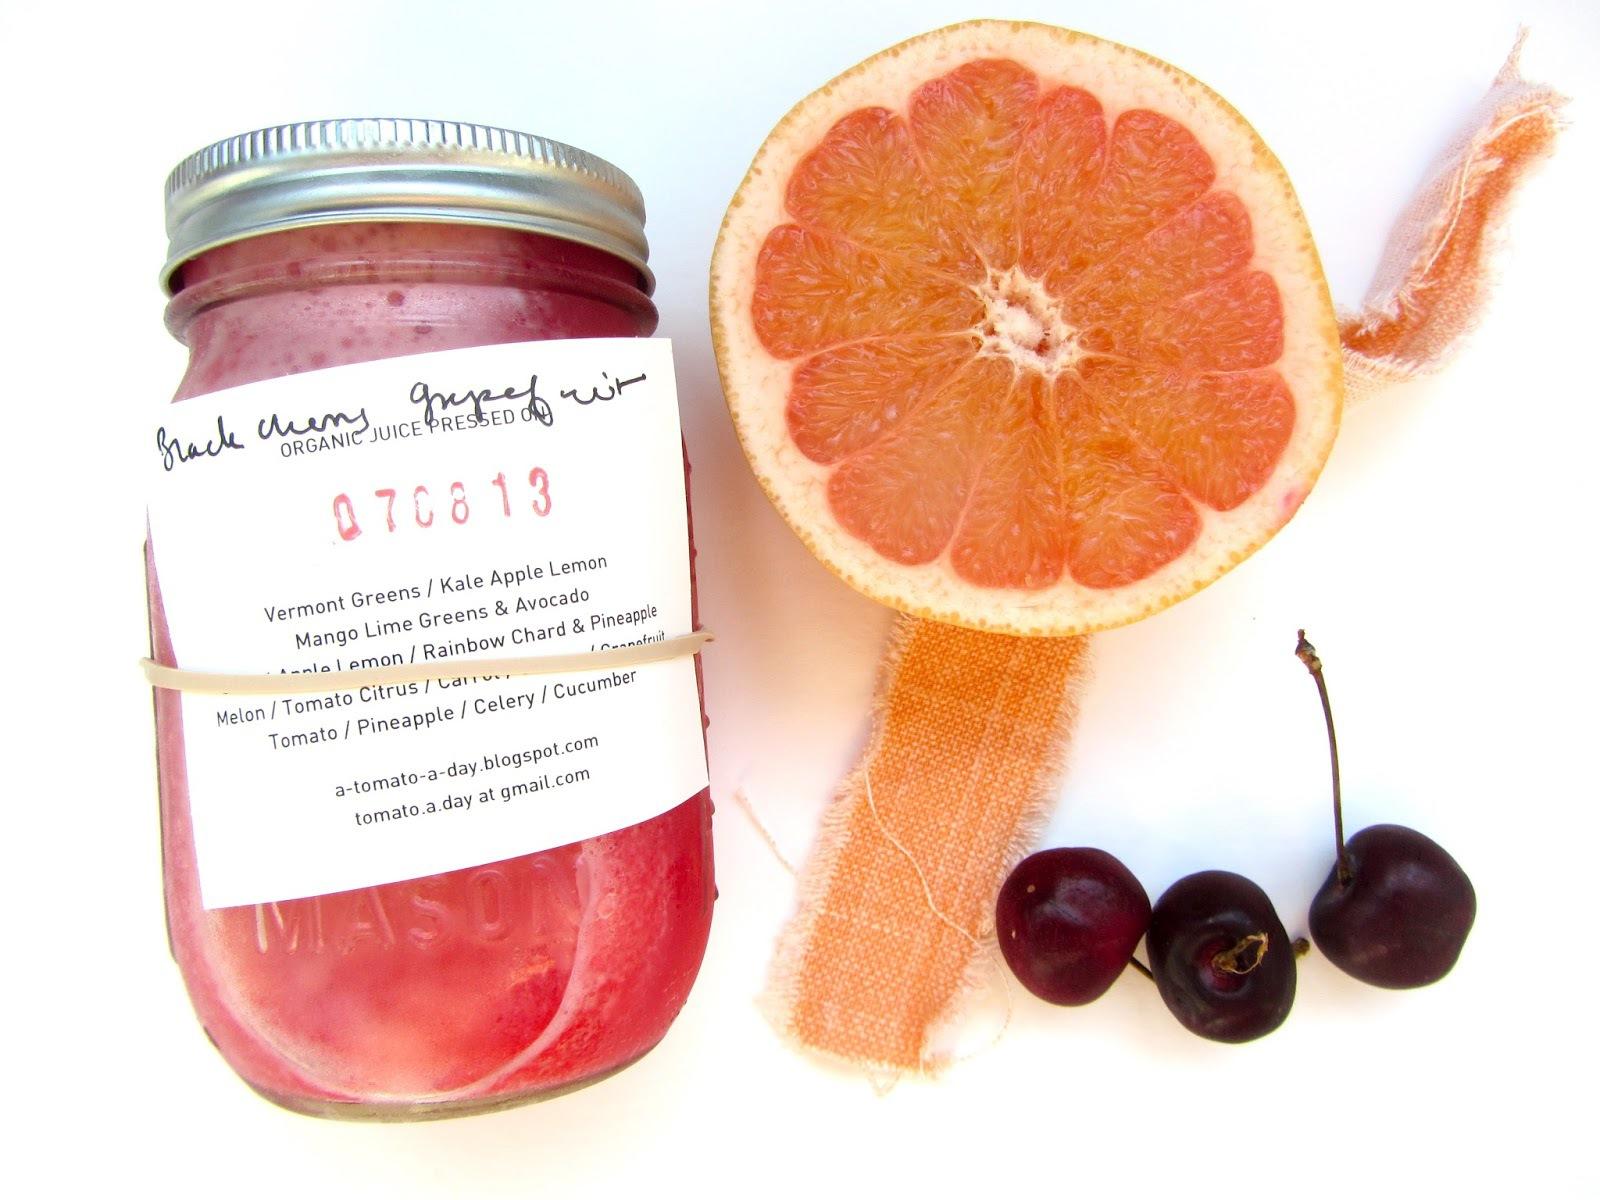 070813_BlackCherry Grapefruit.jpg